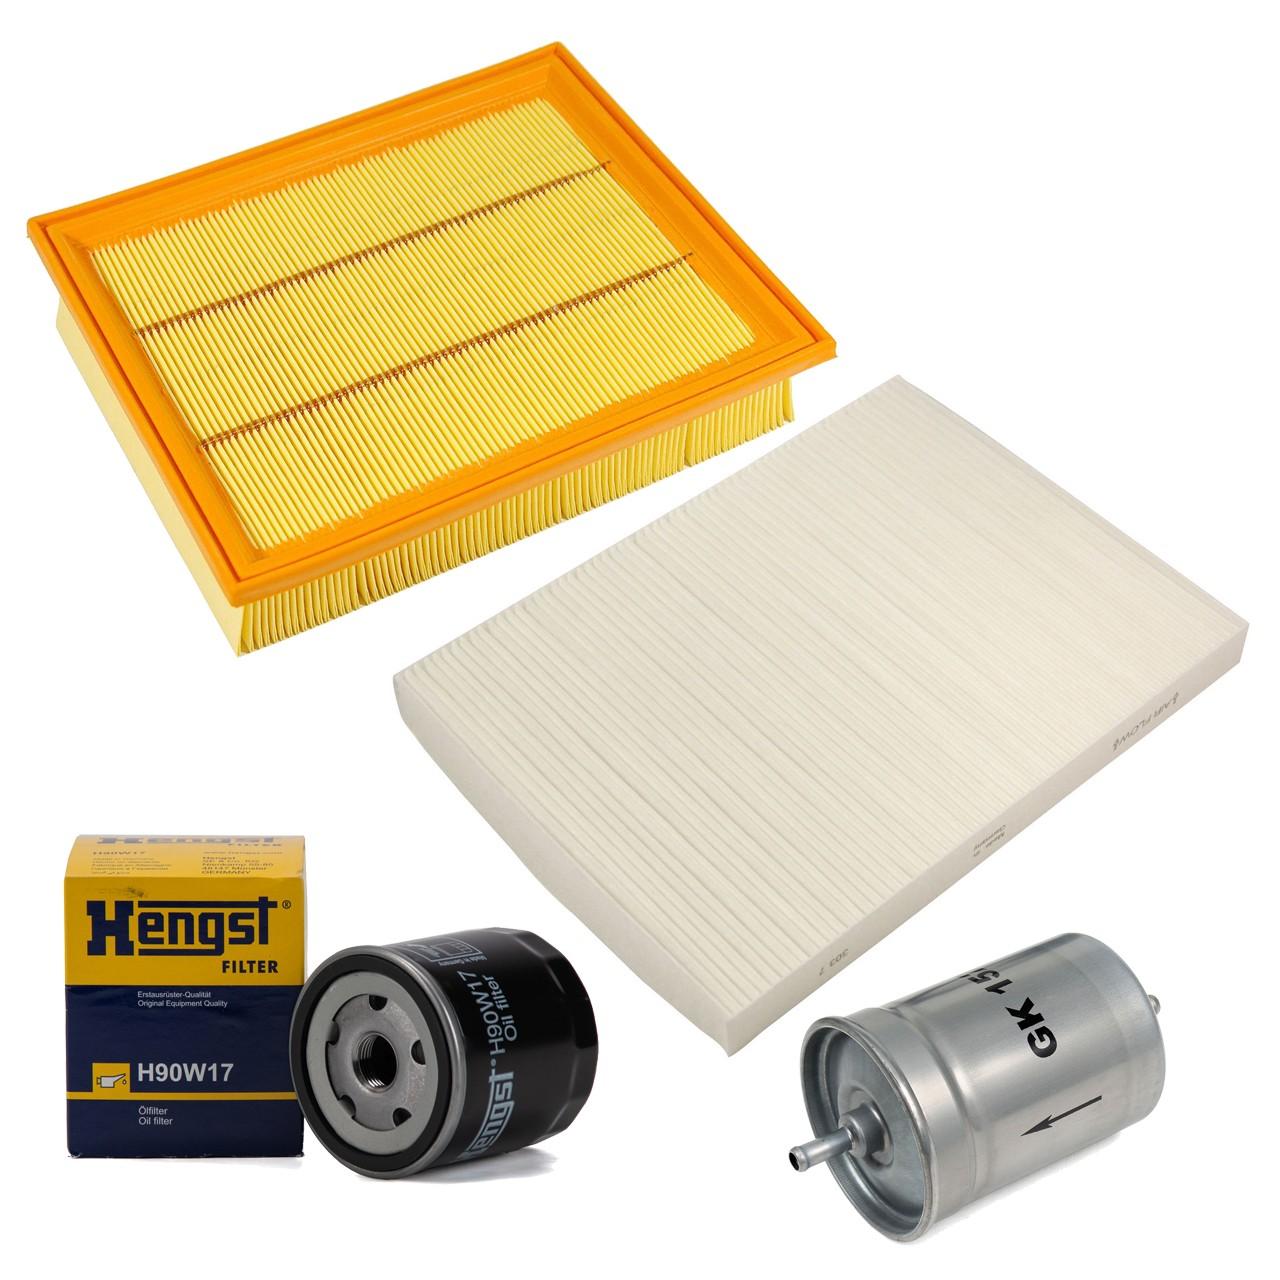 Inspektionskit Filterpaket Filterset für VW Golf III Vento 1.4 1.6 55/60/75 PS